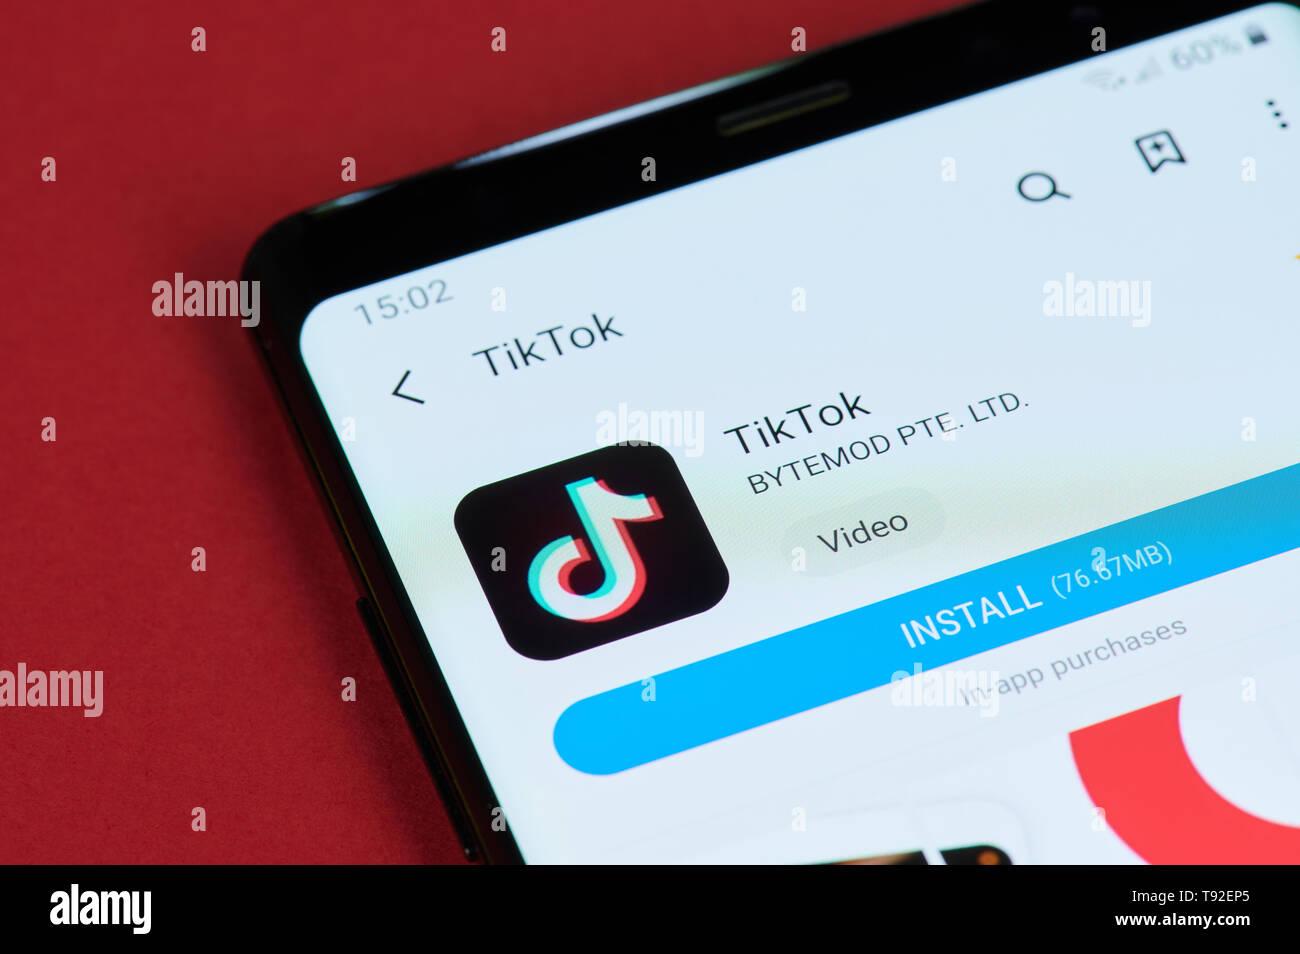 New york, USA - May 15, 2019: Installing TikTok app on